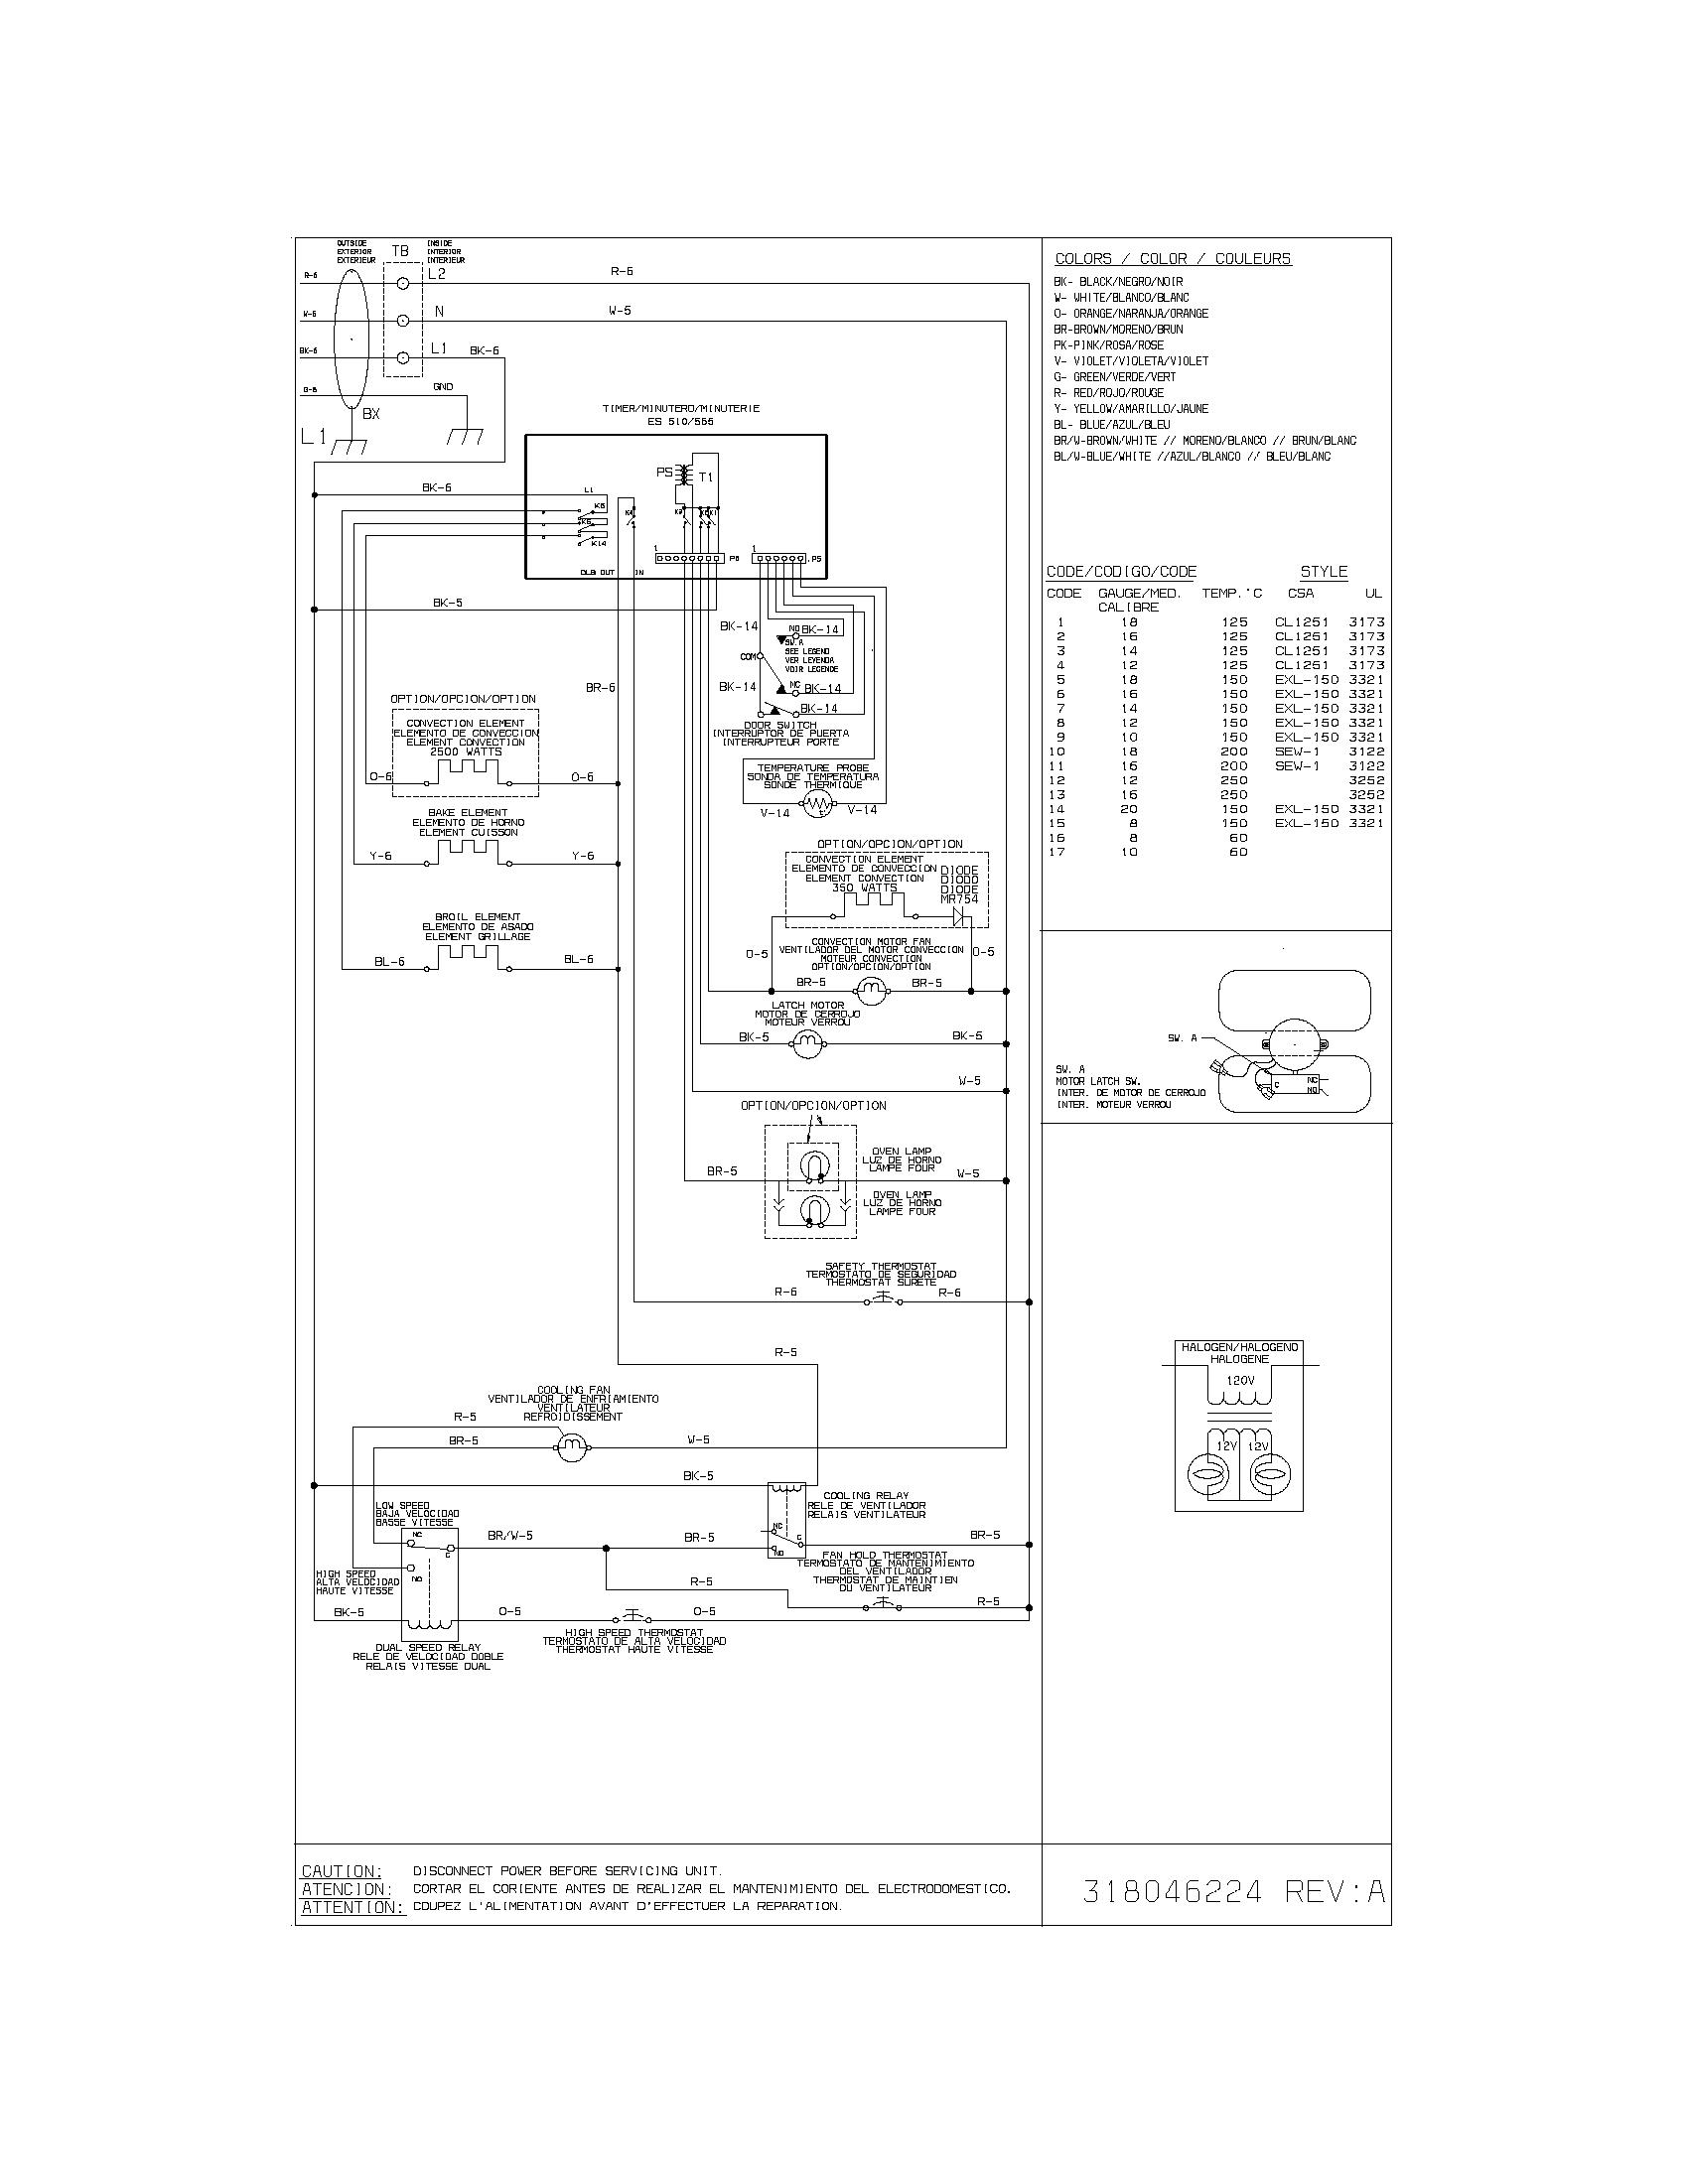 Sumg 100 Wiring Diagram